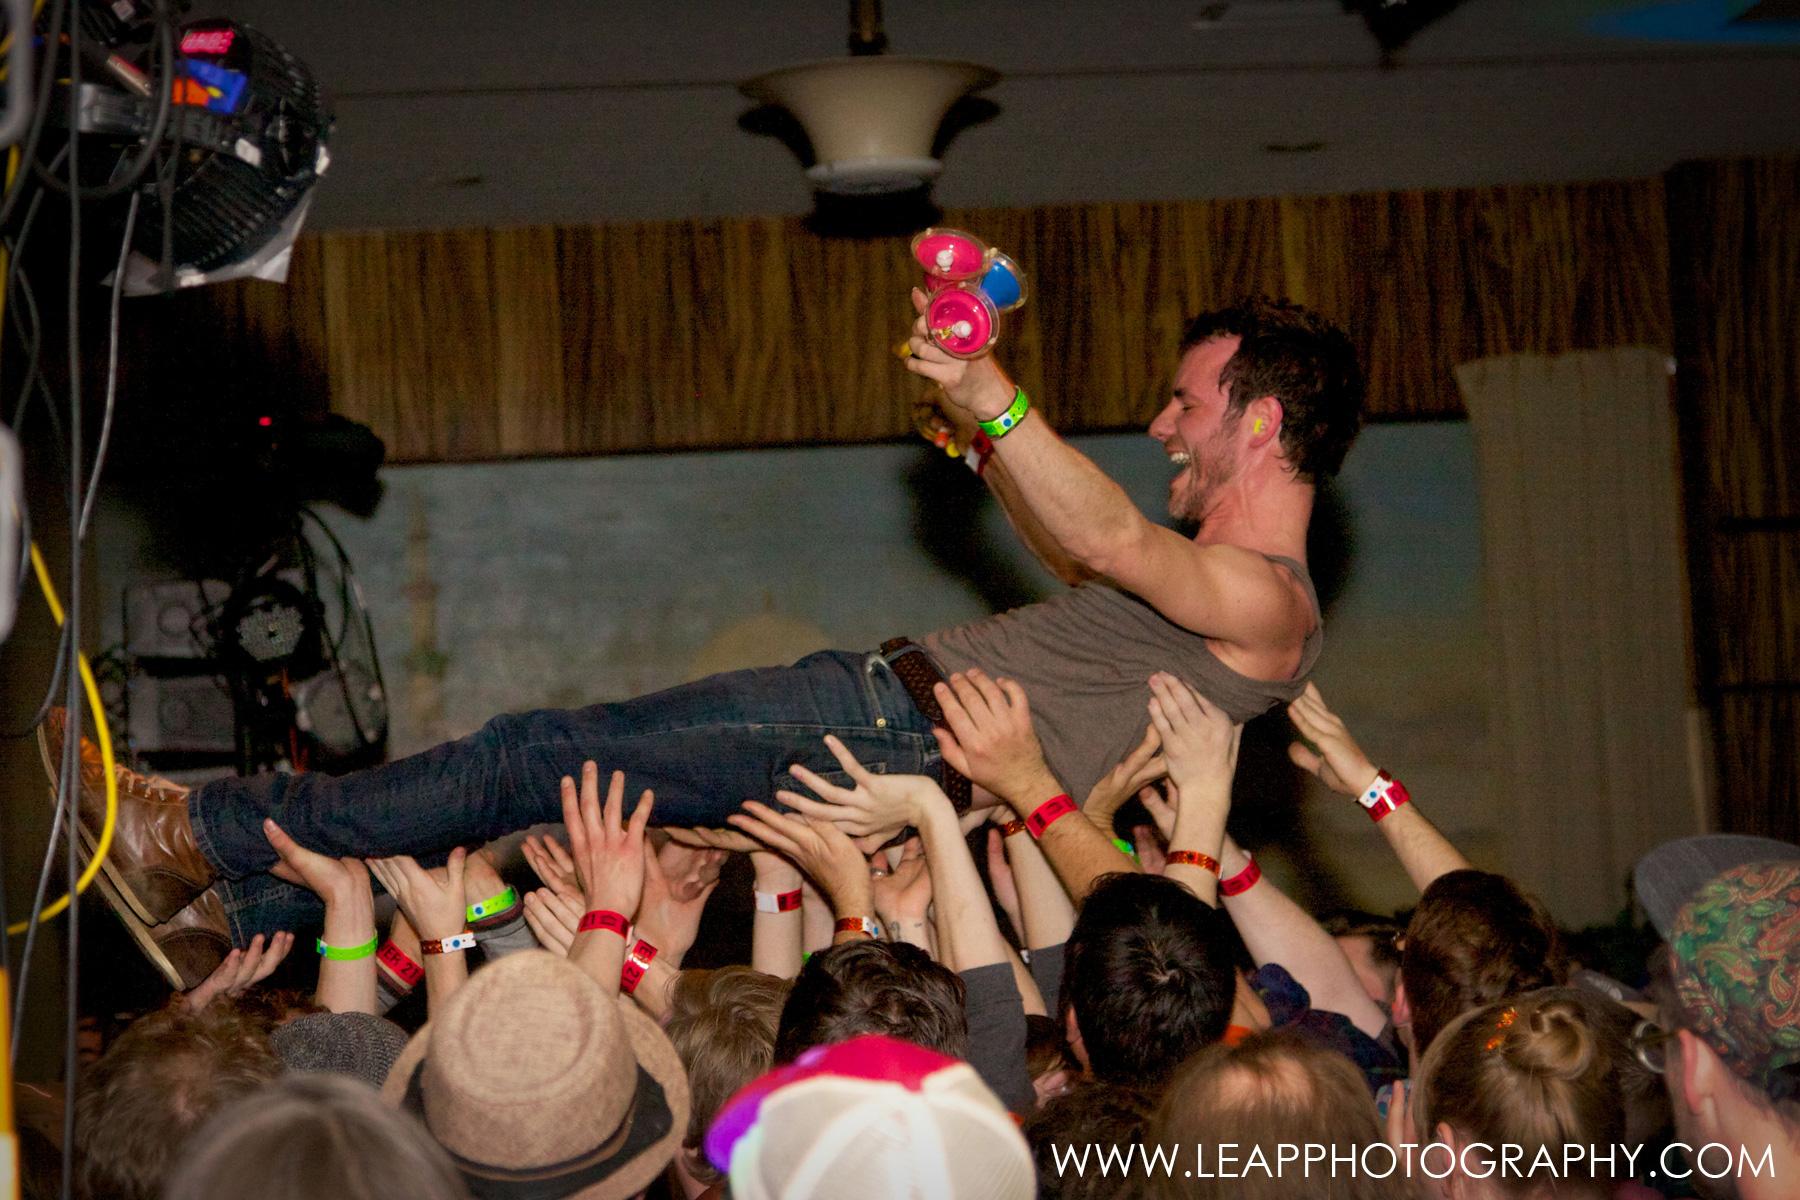 musician crowd surfs at the El Korah during Treefort 2014